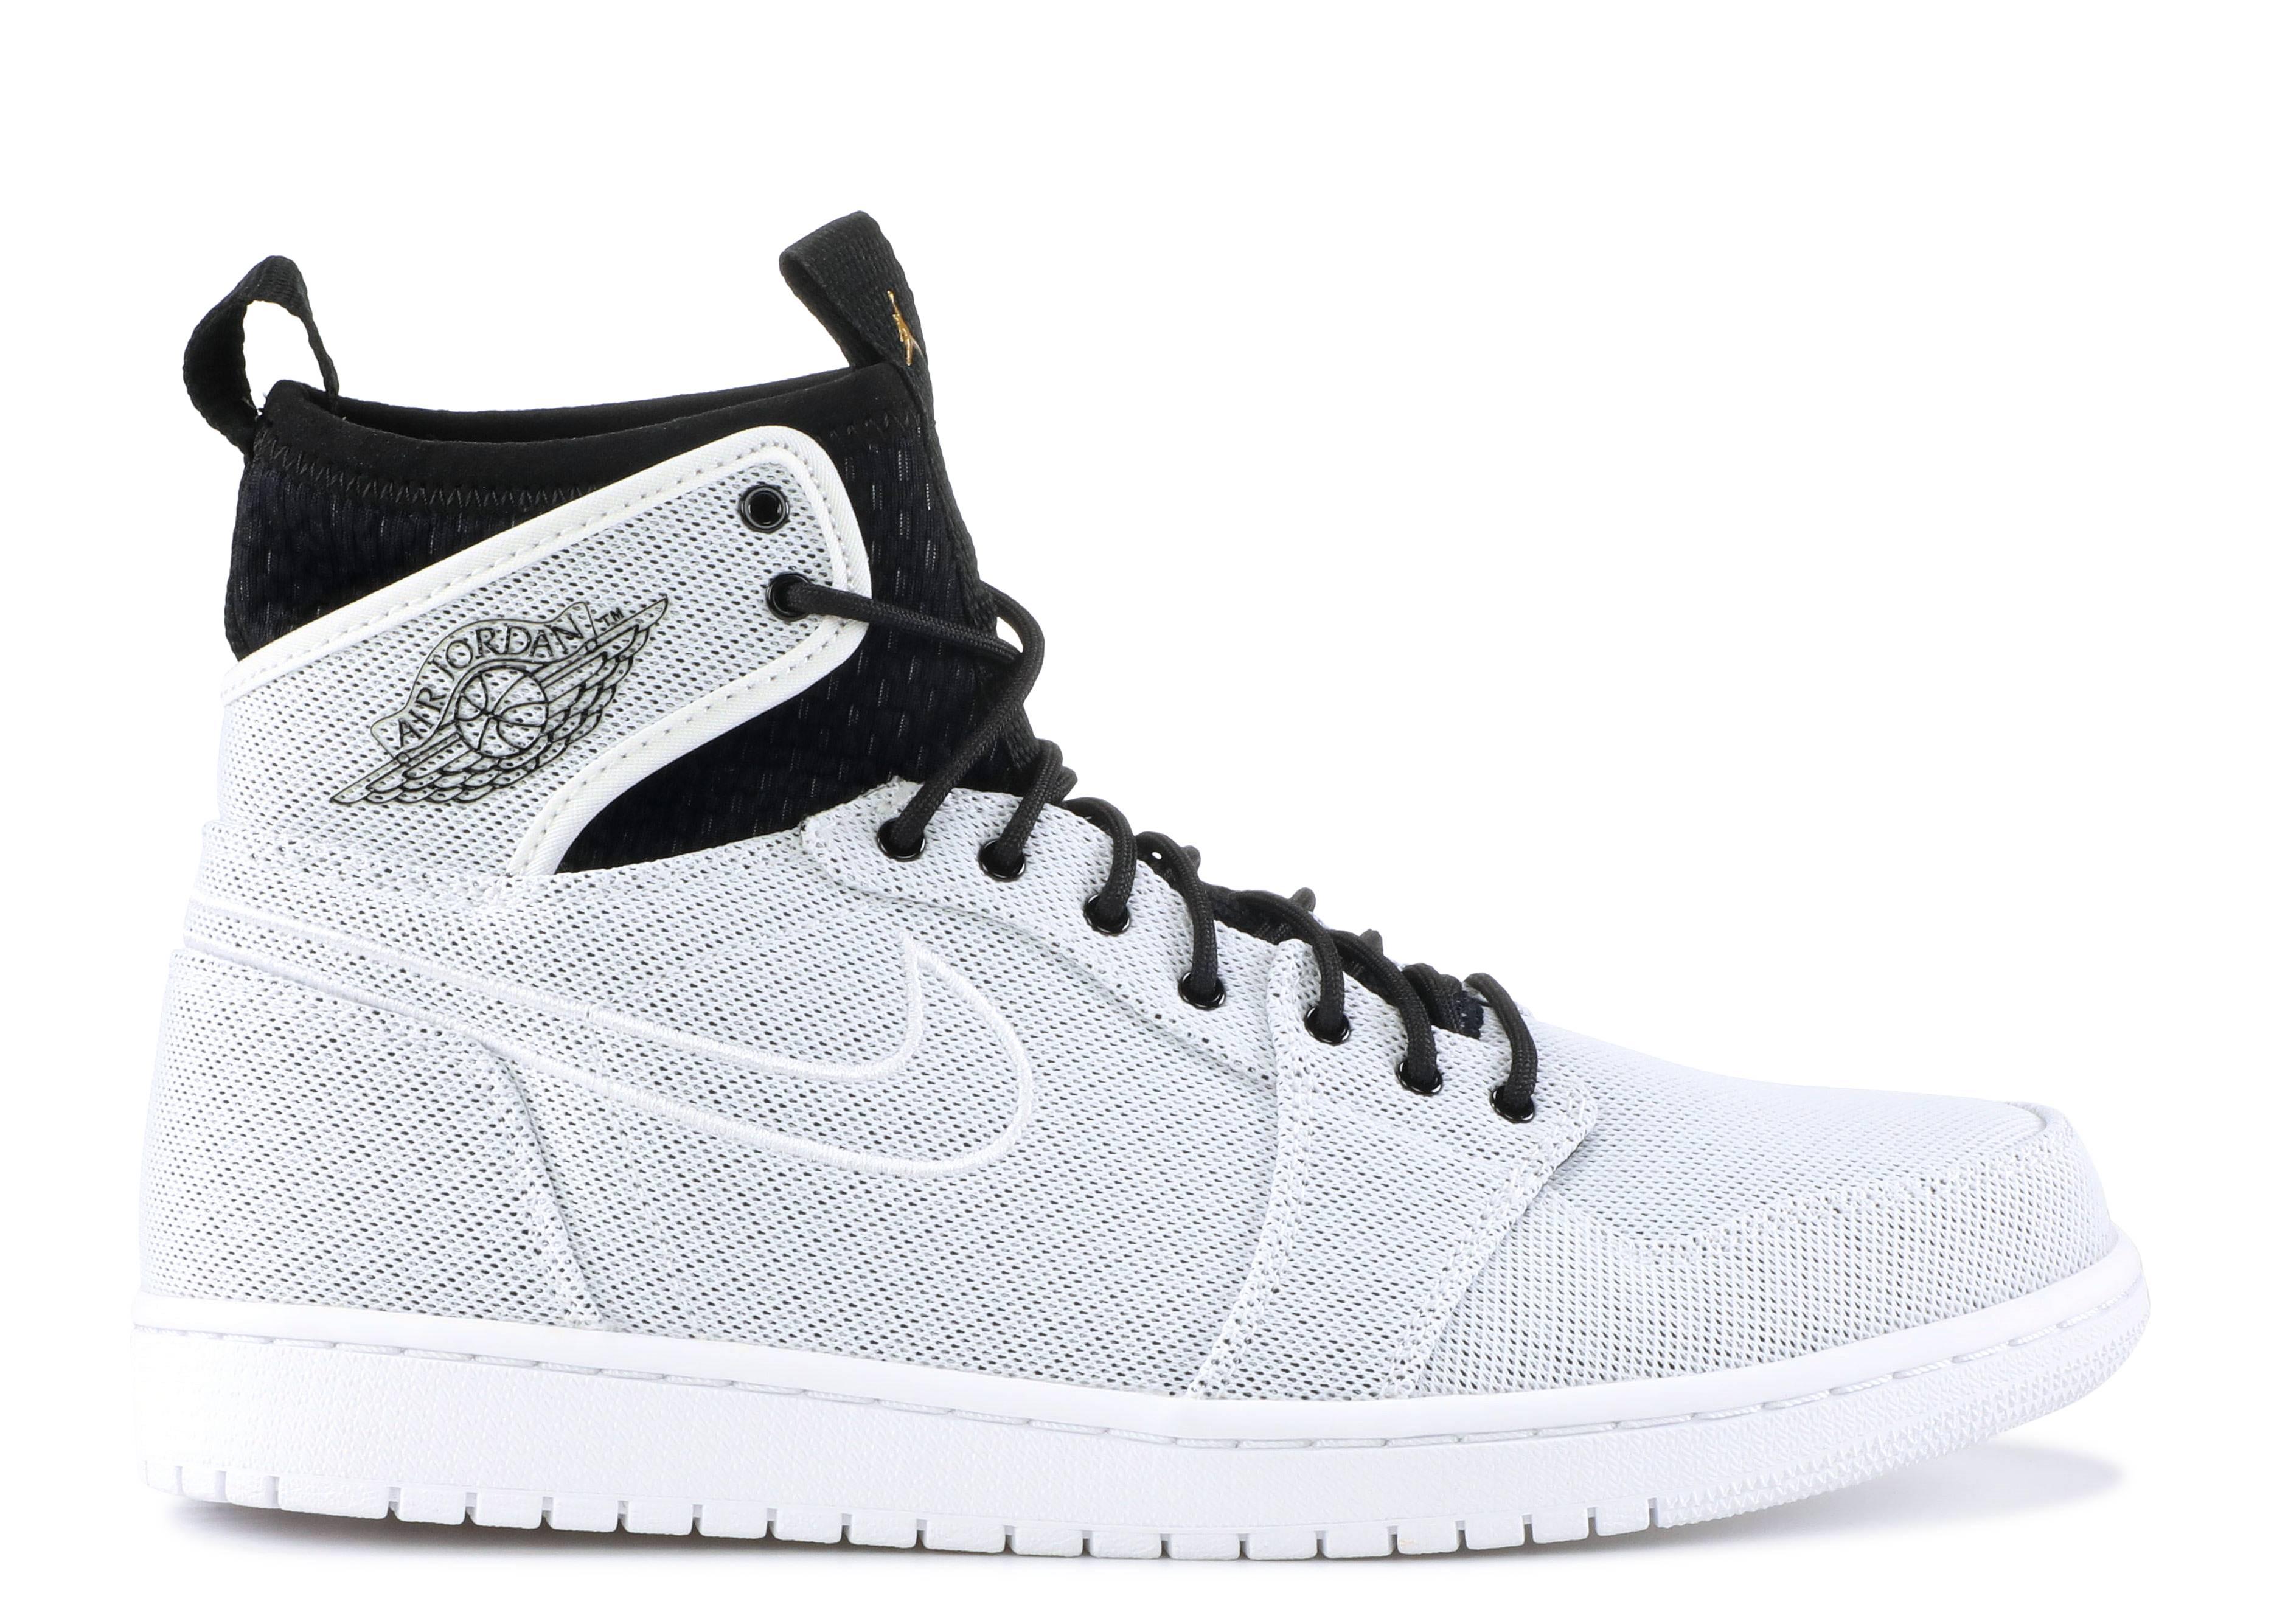 the latest sneakers half off Air Jordan 1 Retro Ultra High